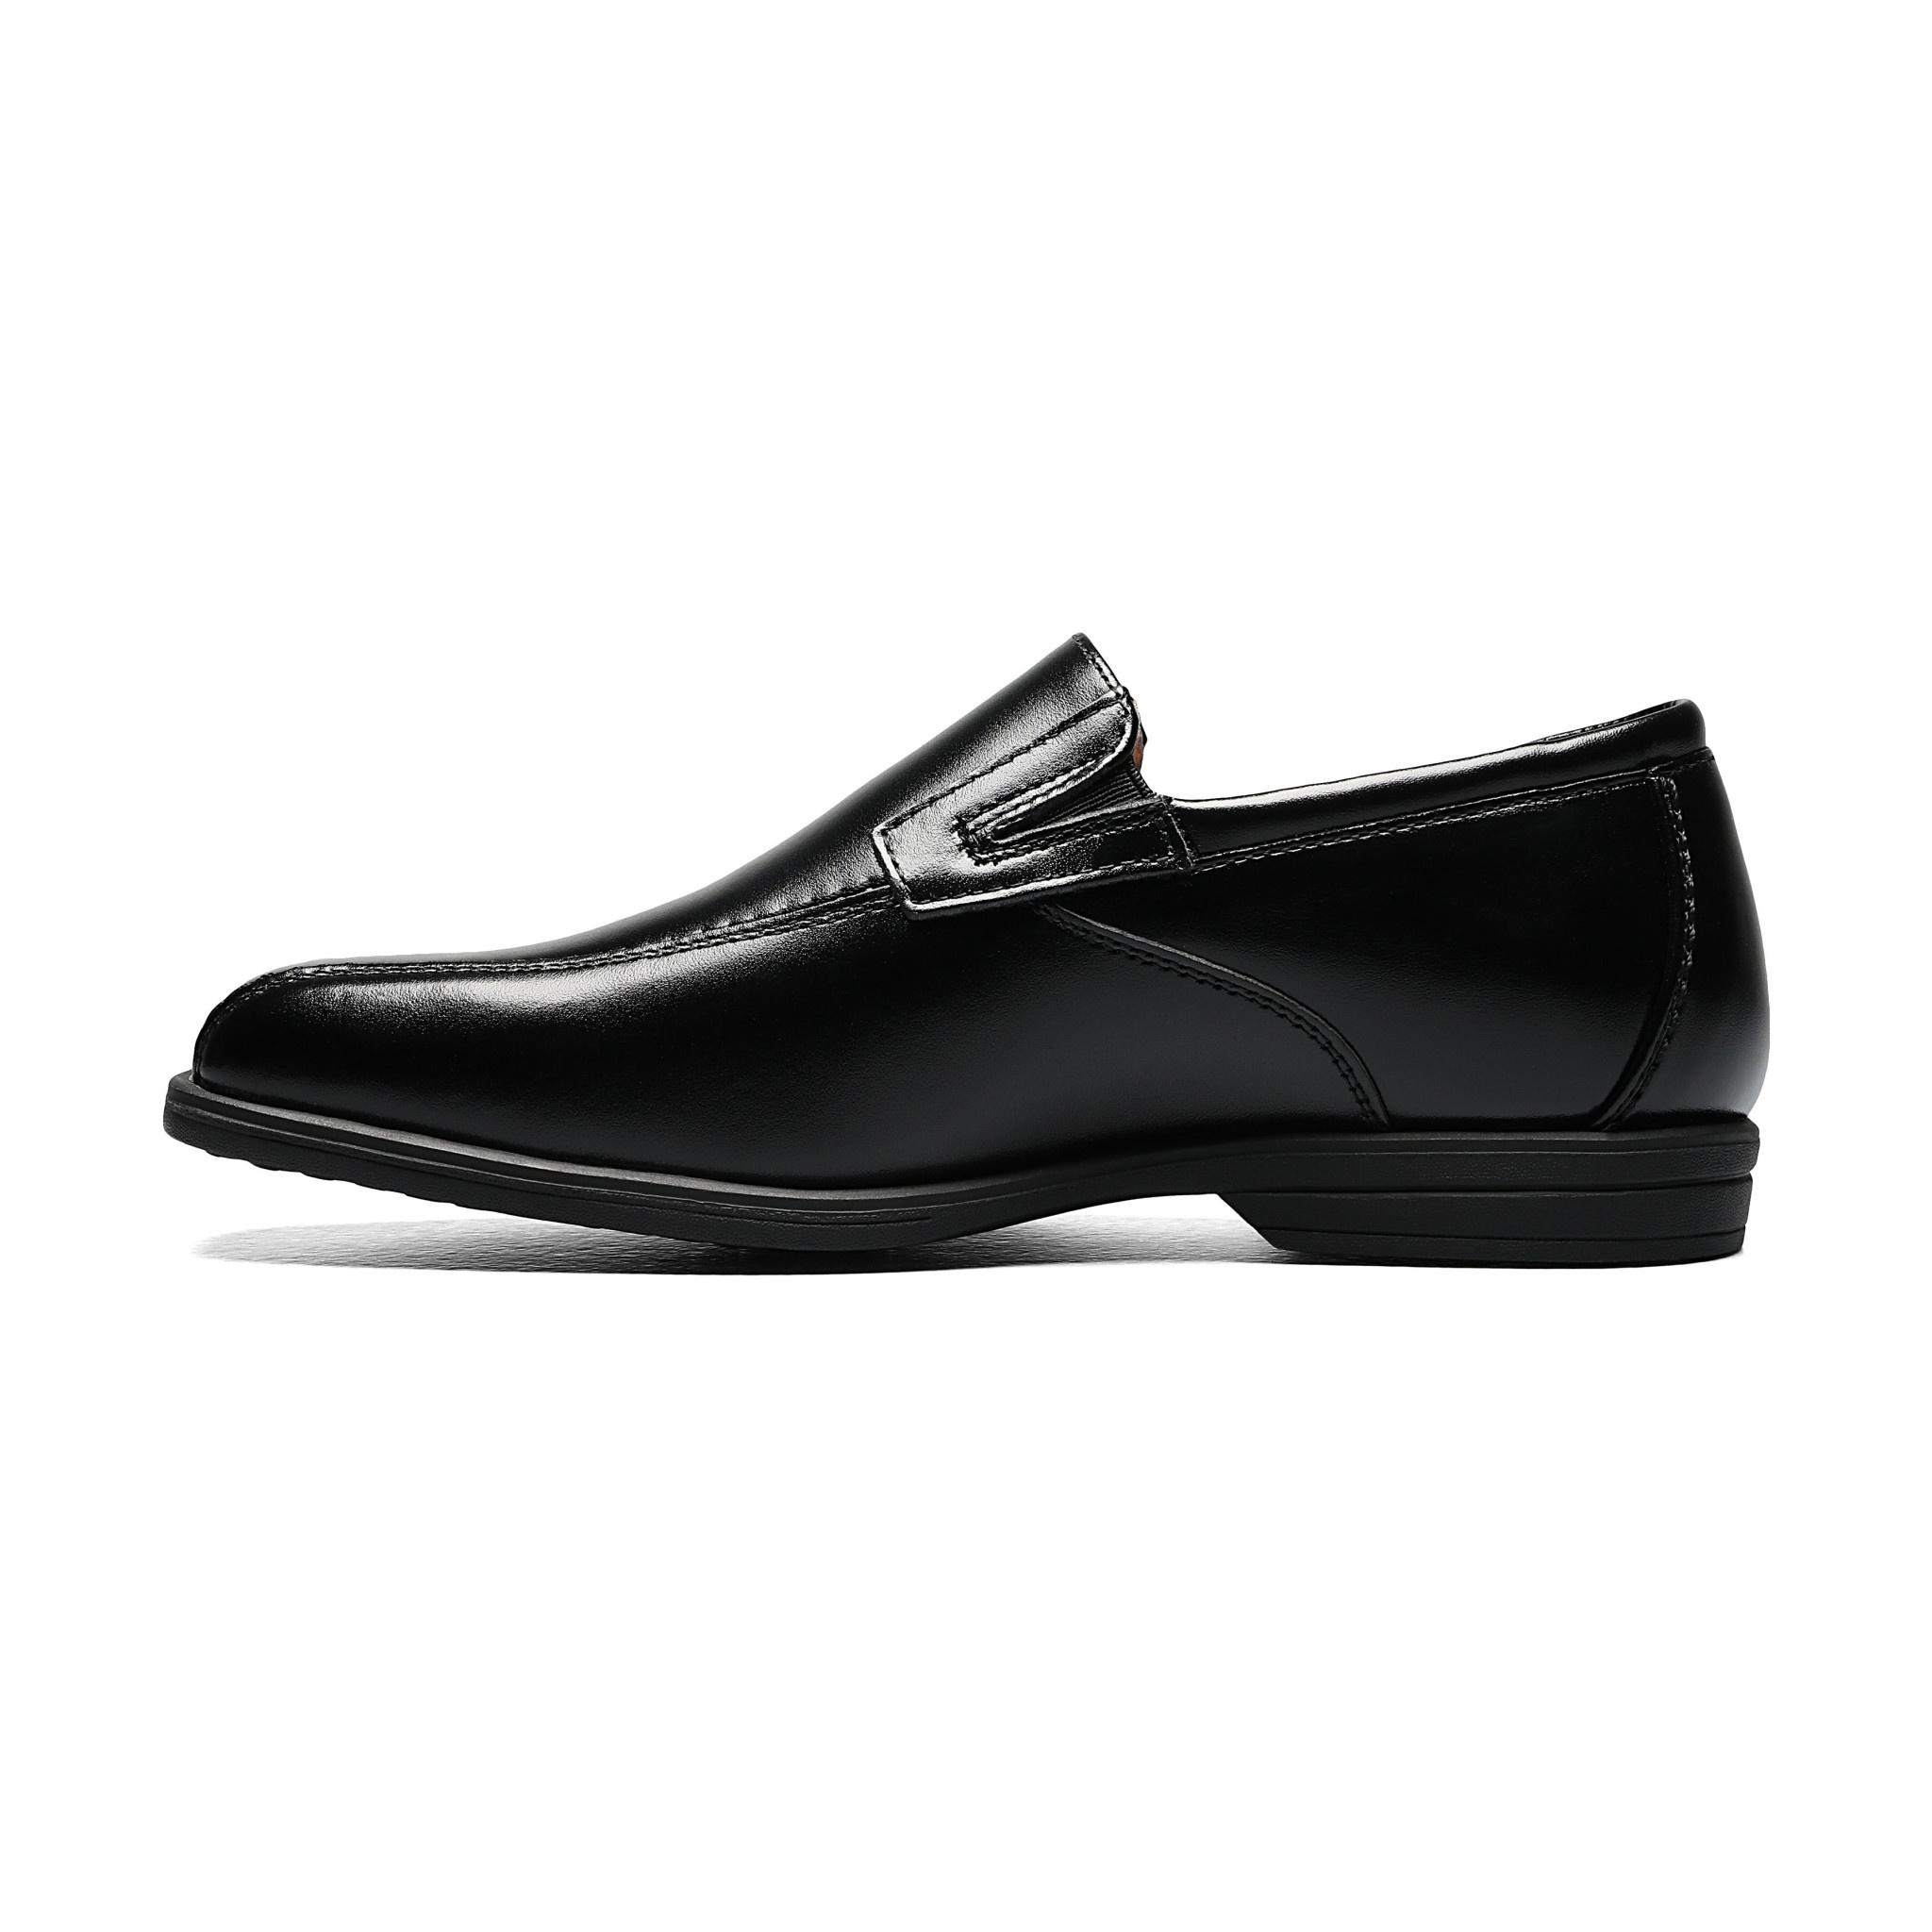 Boys Black Slip-On Dress Shoe